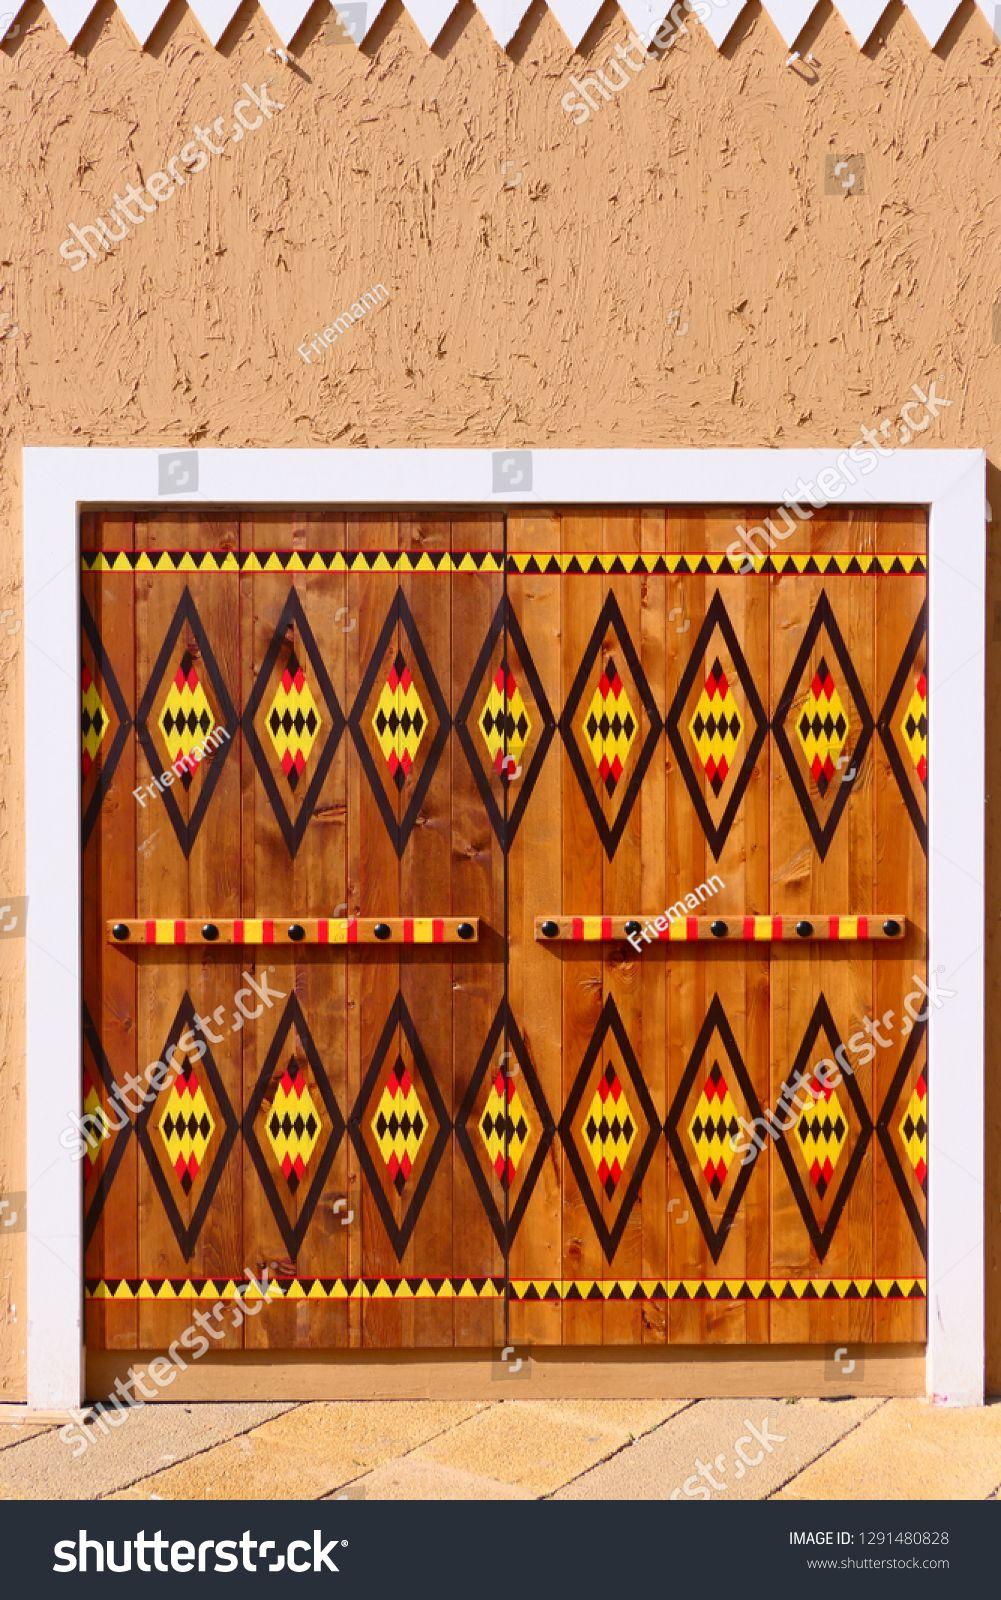 Diriyah Saudi Arabia C December 17 2018 A Historic Door In The Old City Of Diriyah An Unesco Worl Historic Doors Arabic Calligraphy Tattoo Art Inspiration